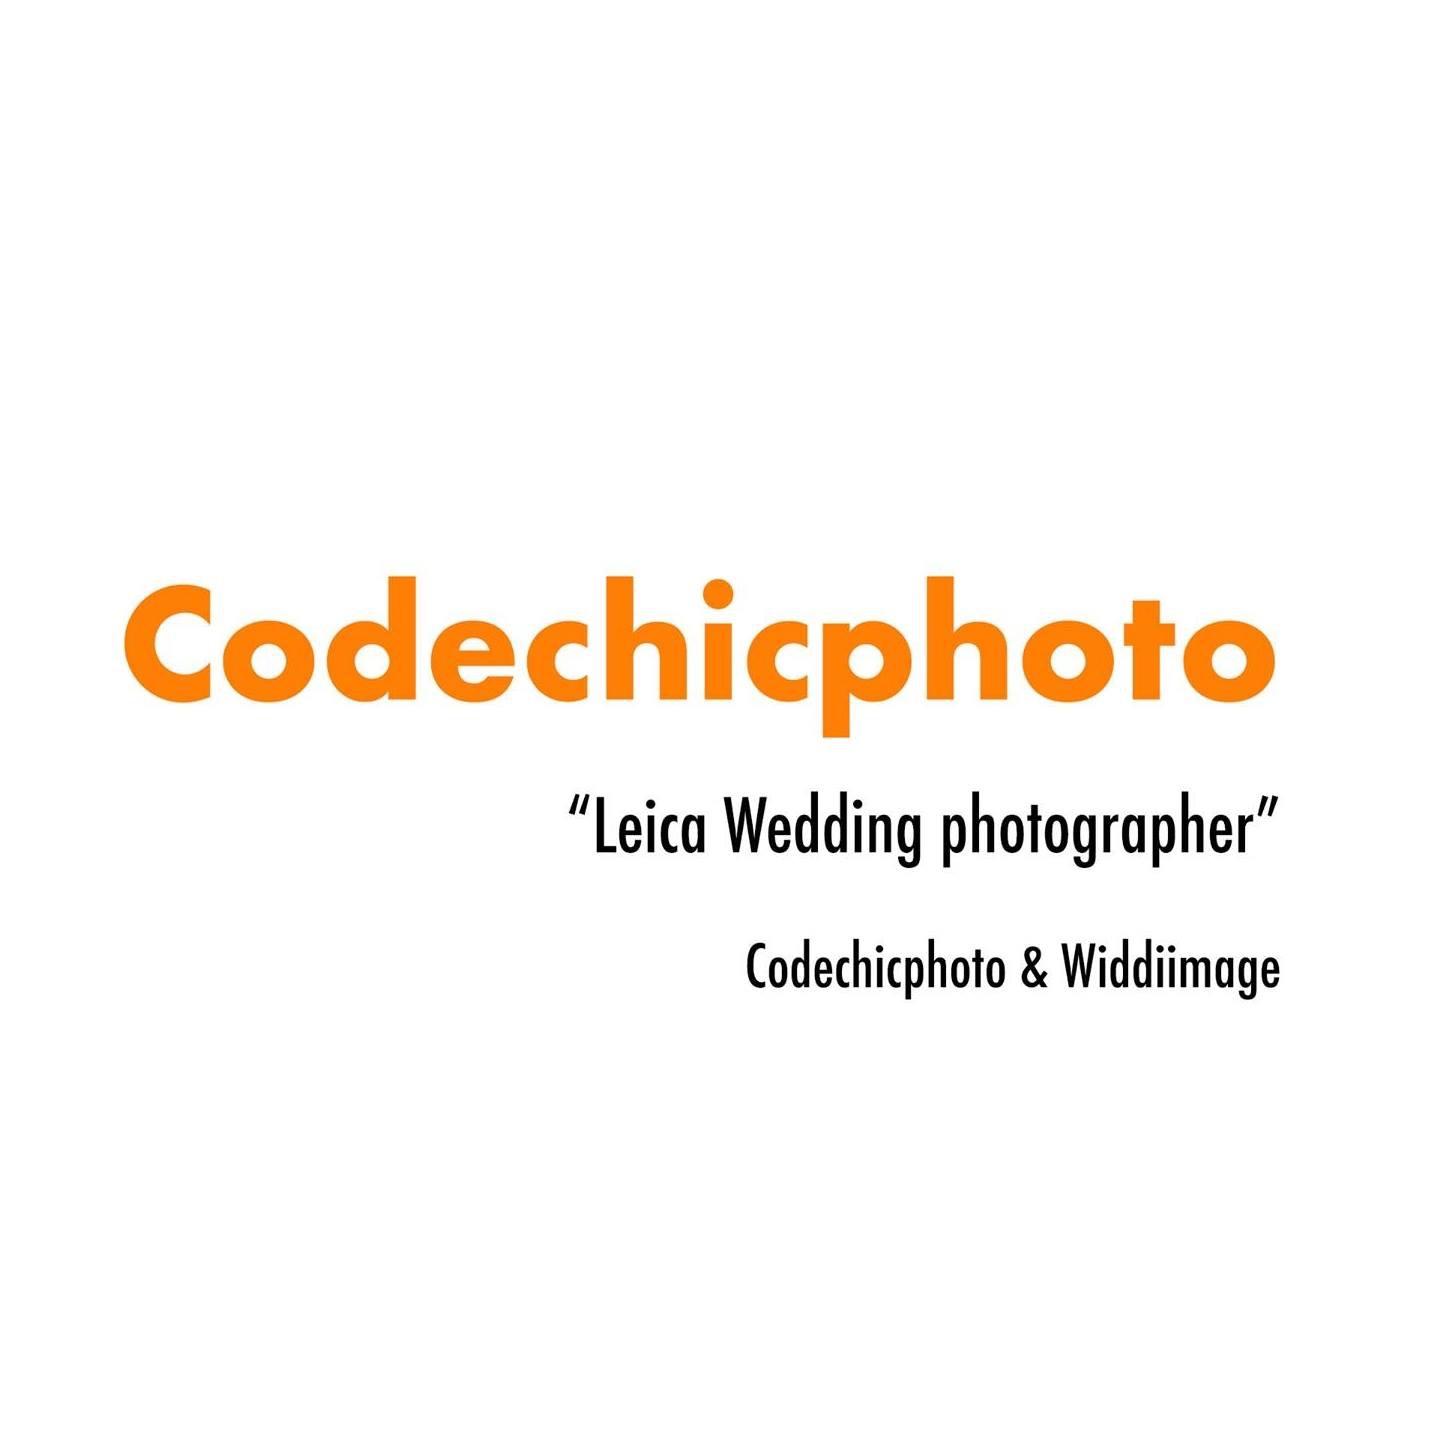 CODECHIC PHOTOGRAPHY